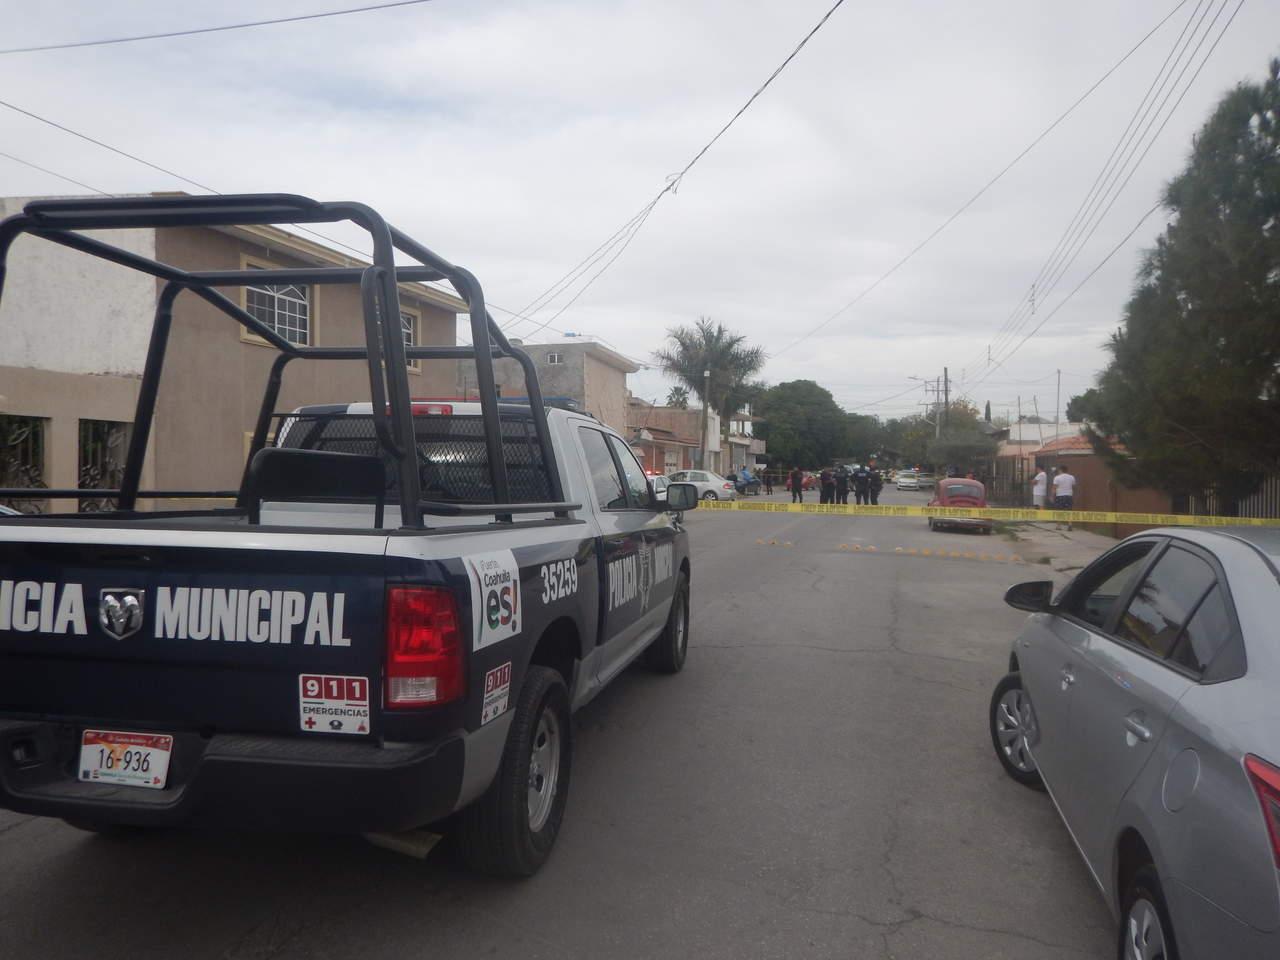 Bajan homicidios dolosos, asegura Fiscalía de Coahuila